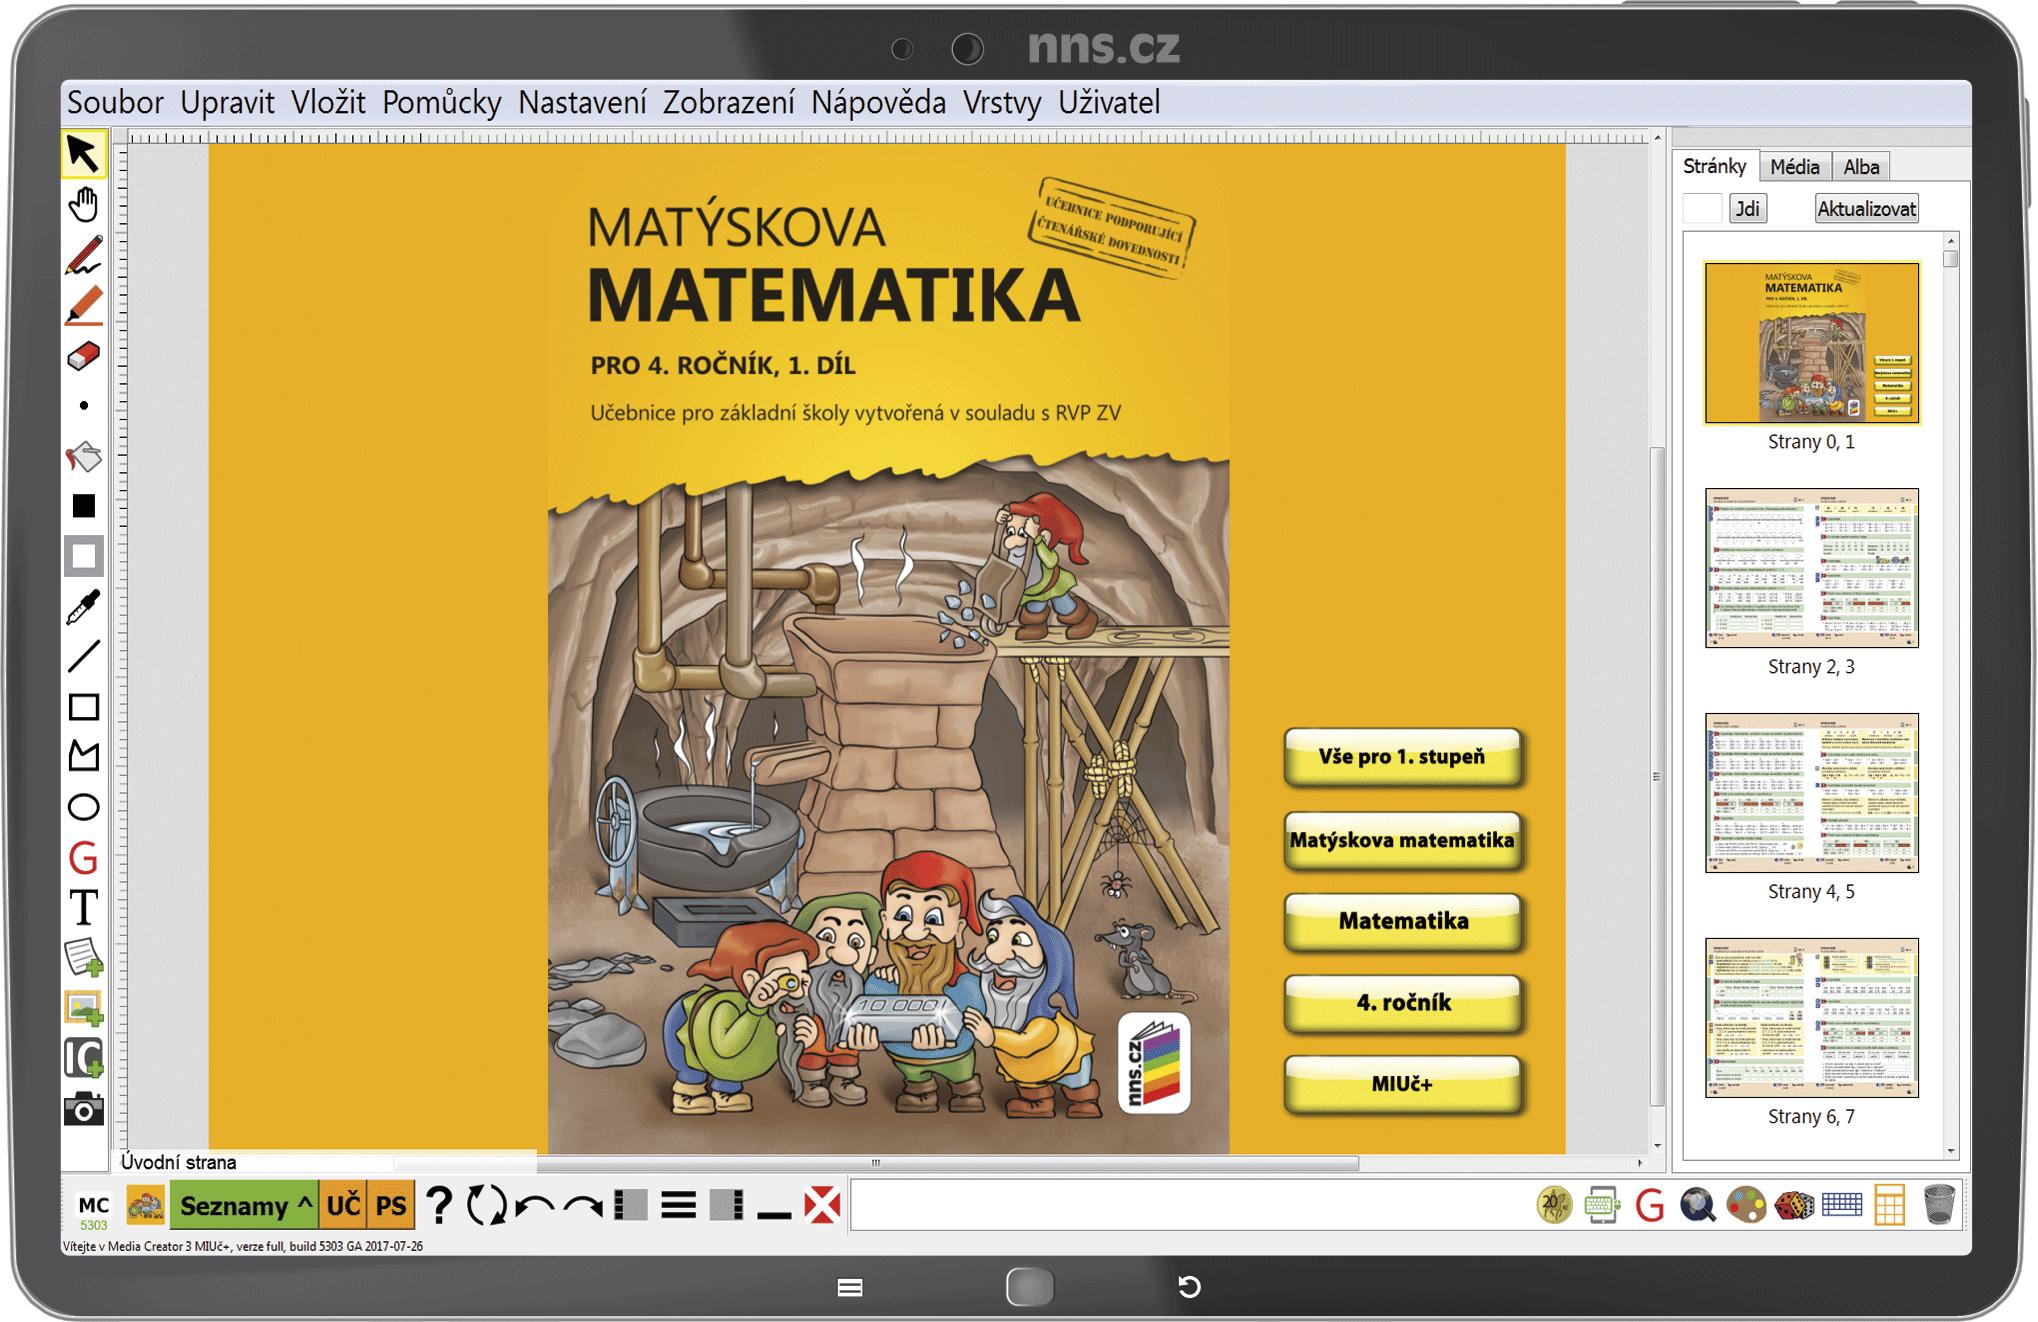 MIUč+ Matýskova matematika 4 (1. díl, 2. díl a geometrie) čas. neomez. šk. multilicence NOVINKA